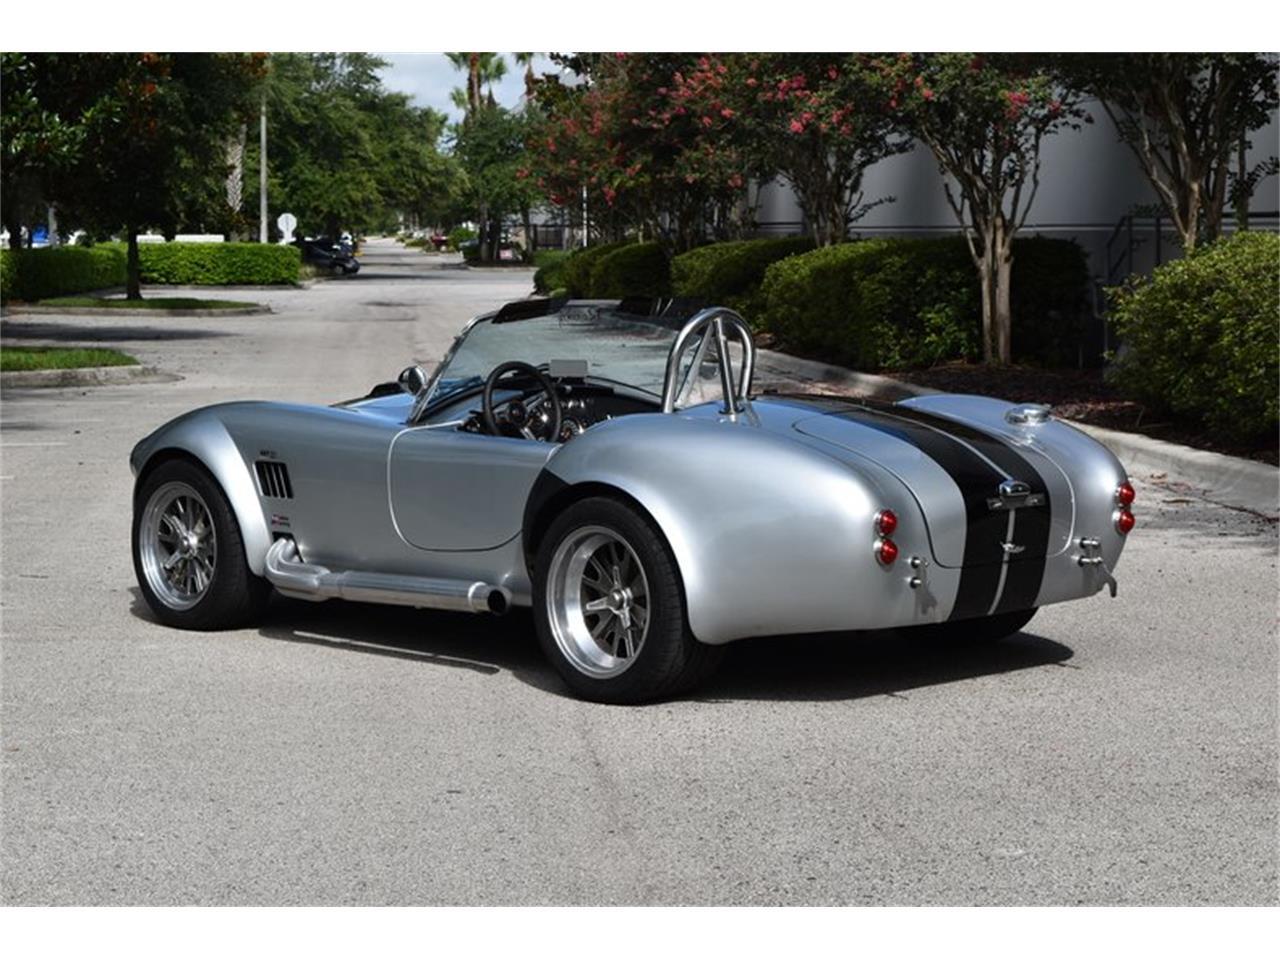 For Sale: 1966 Shelby Cobra in Orlando, Florida